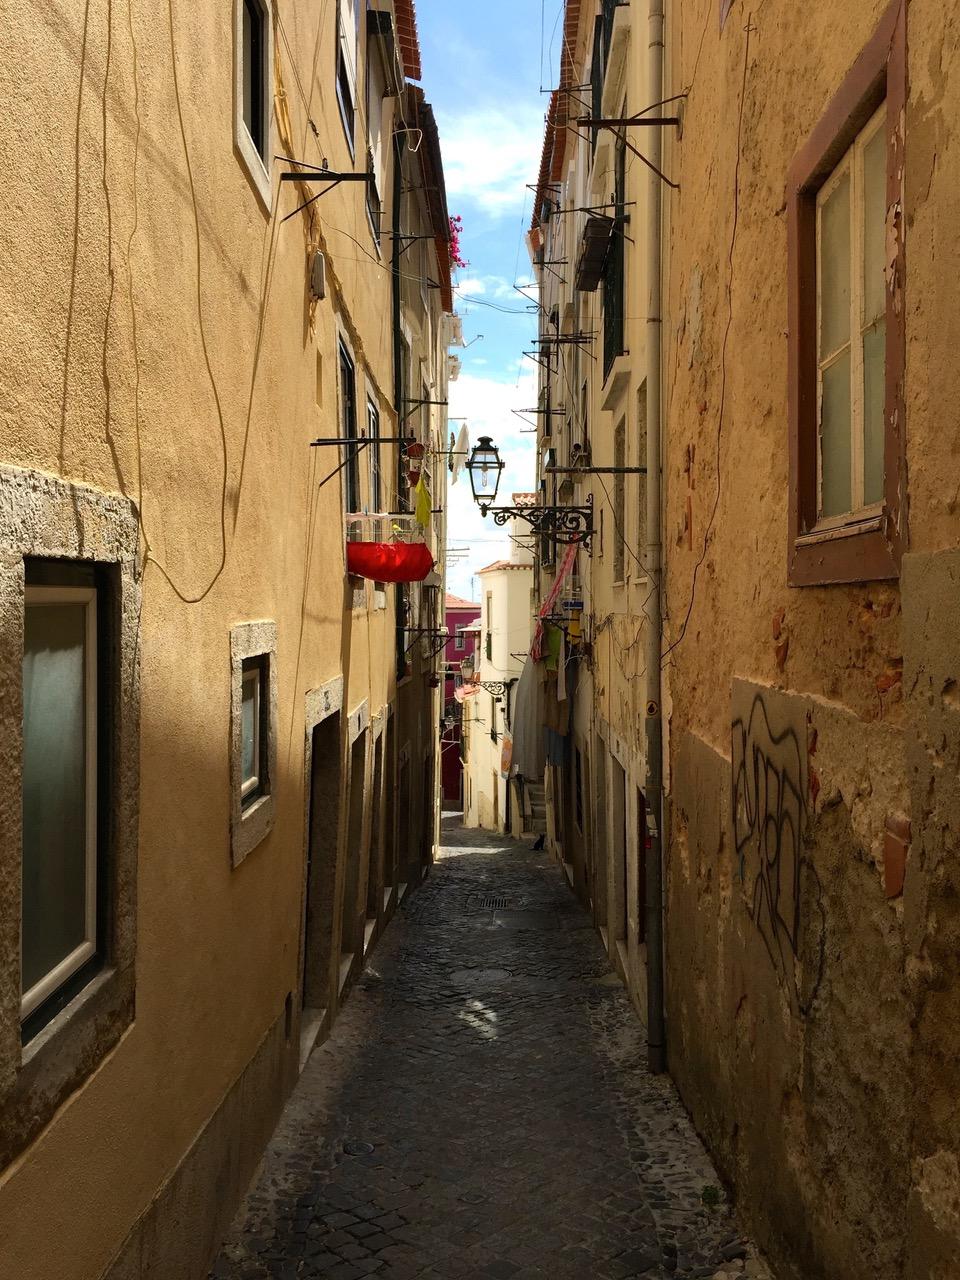 Wandering the streets of Alfama